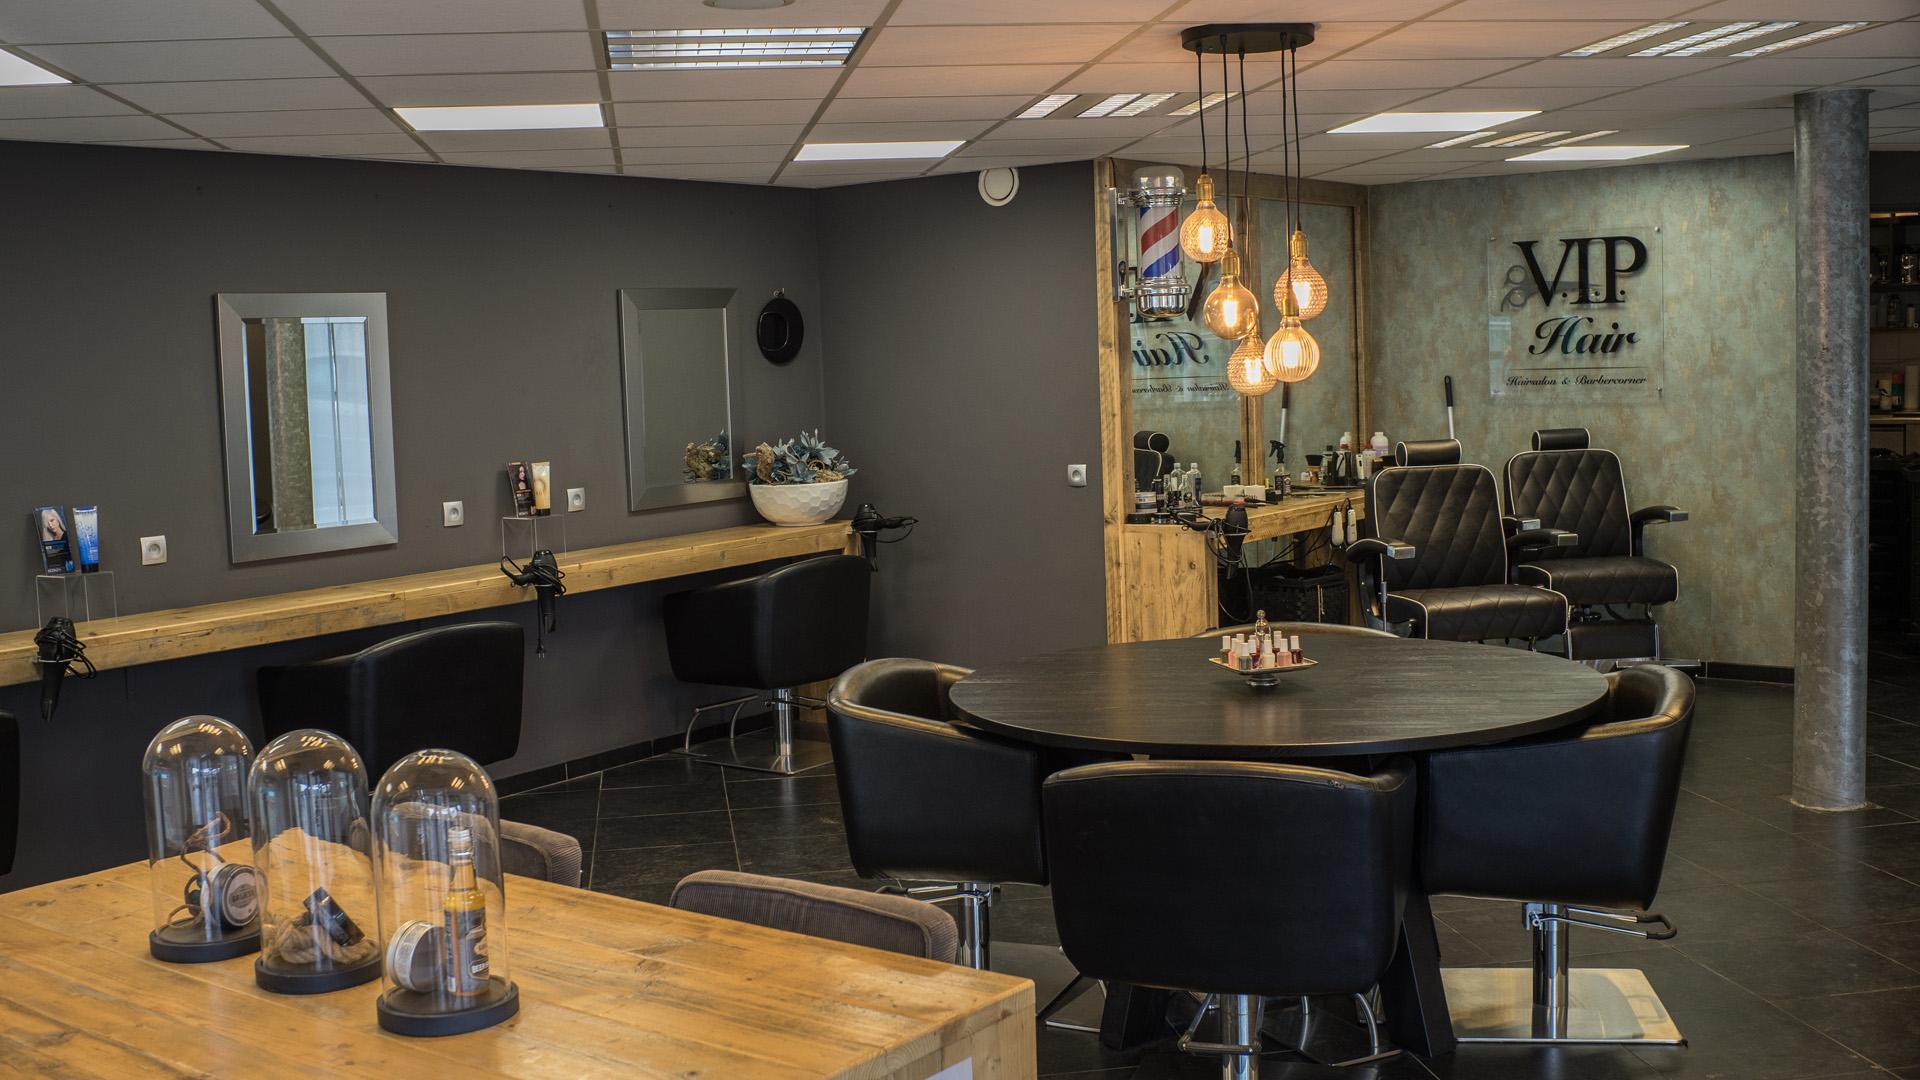 Vip Hair Hair Salon Barber Corner In Kaatsheuvel